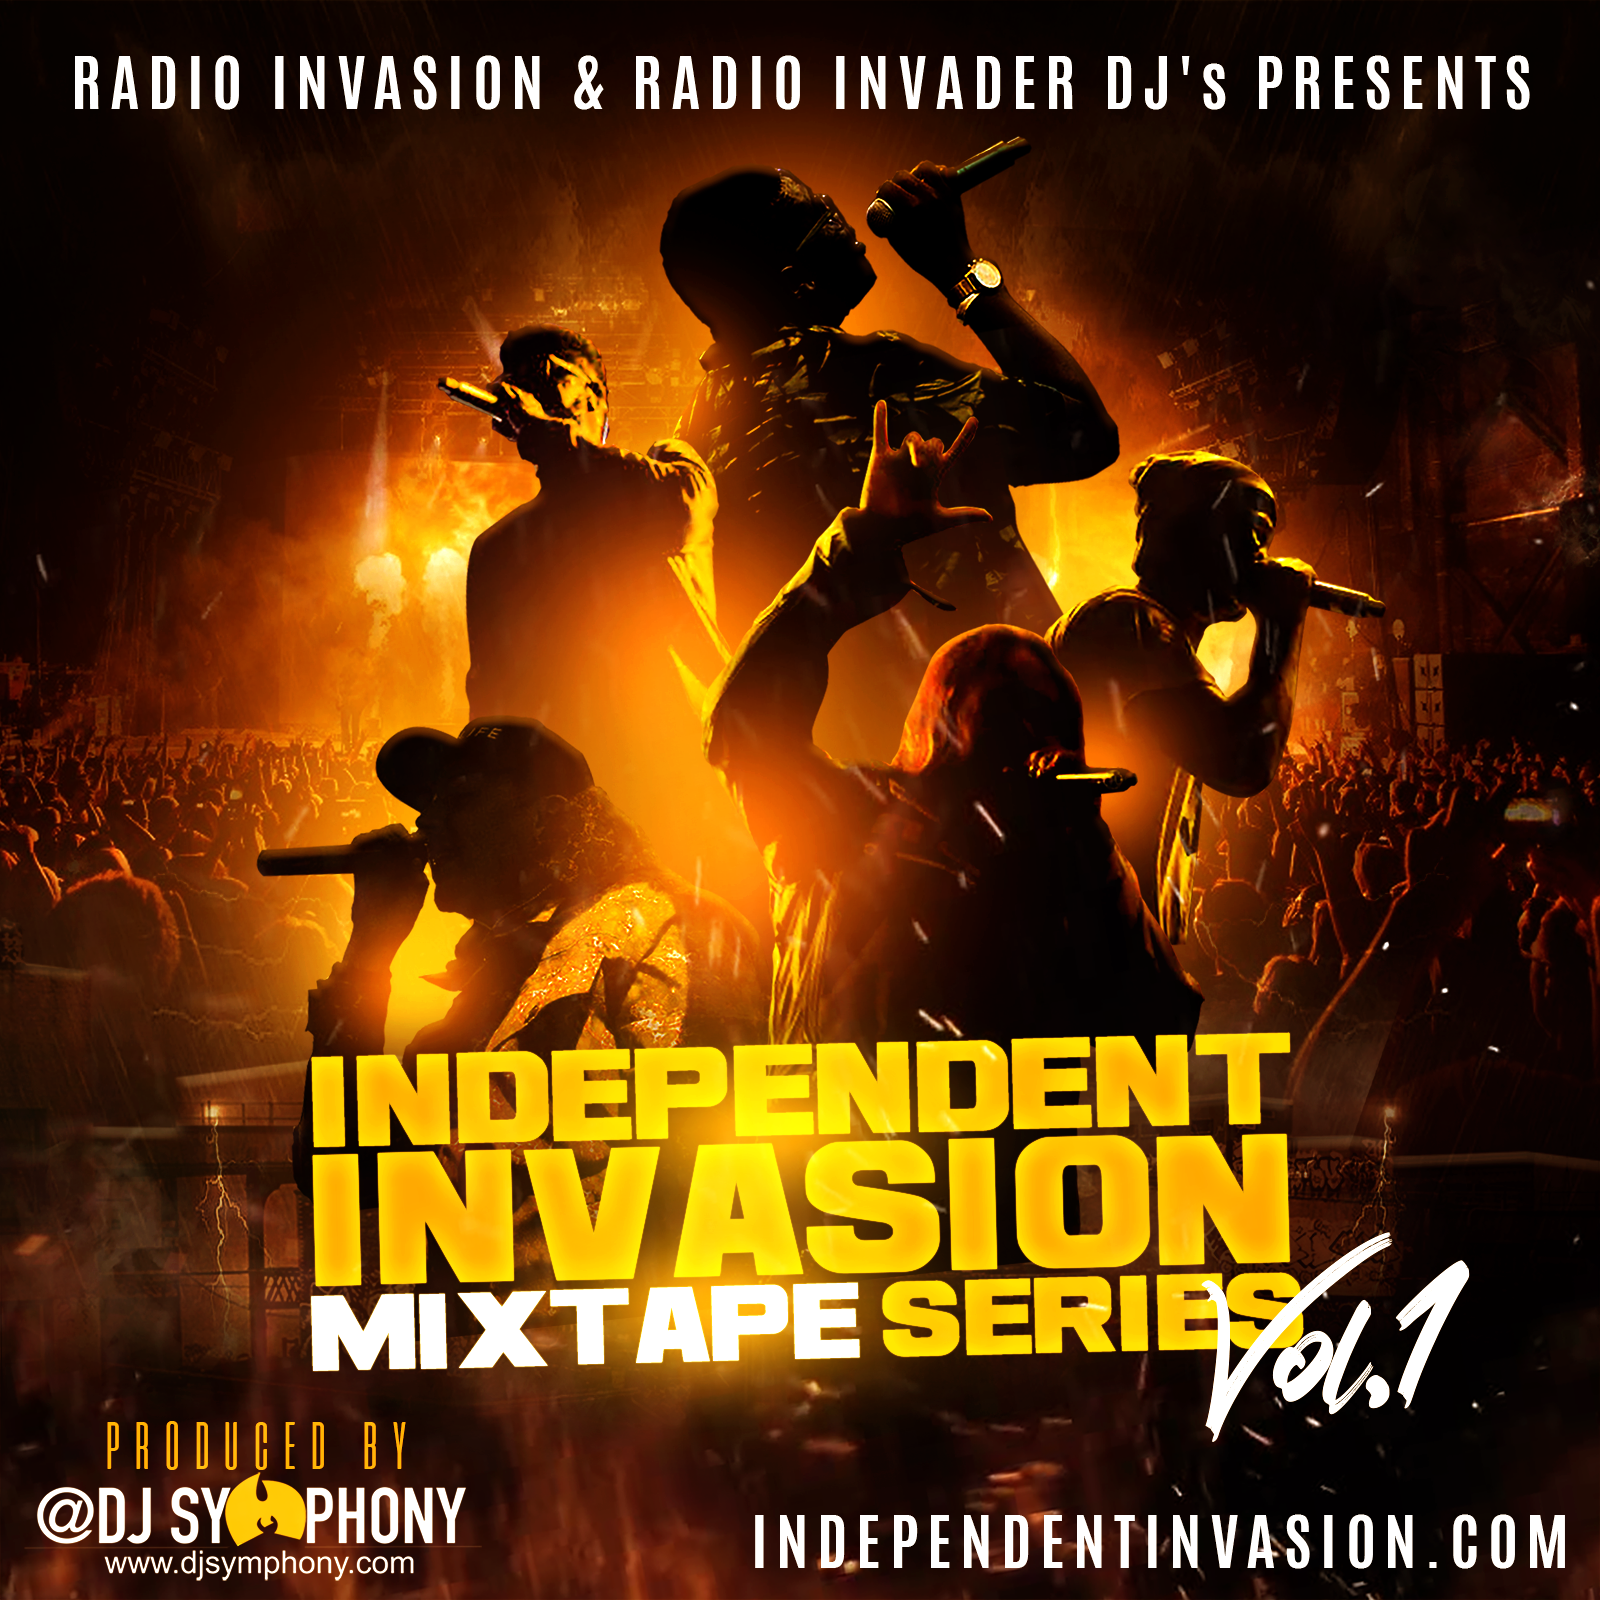 Independent Invasion Vol.1